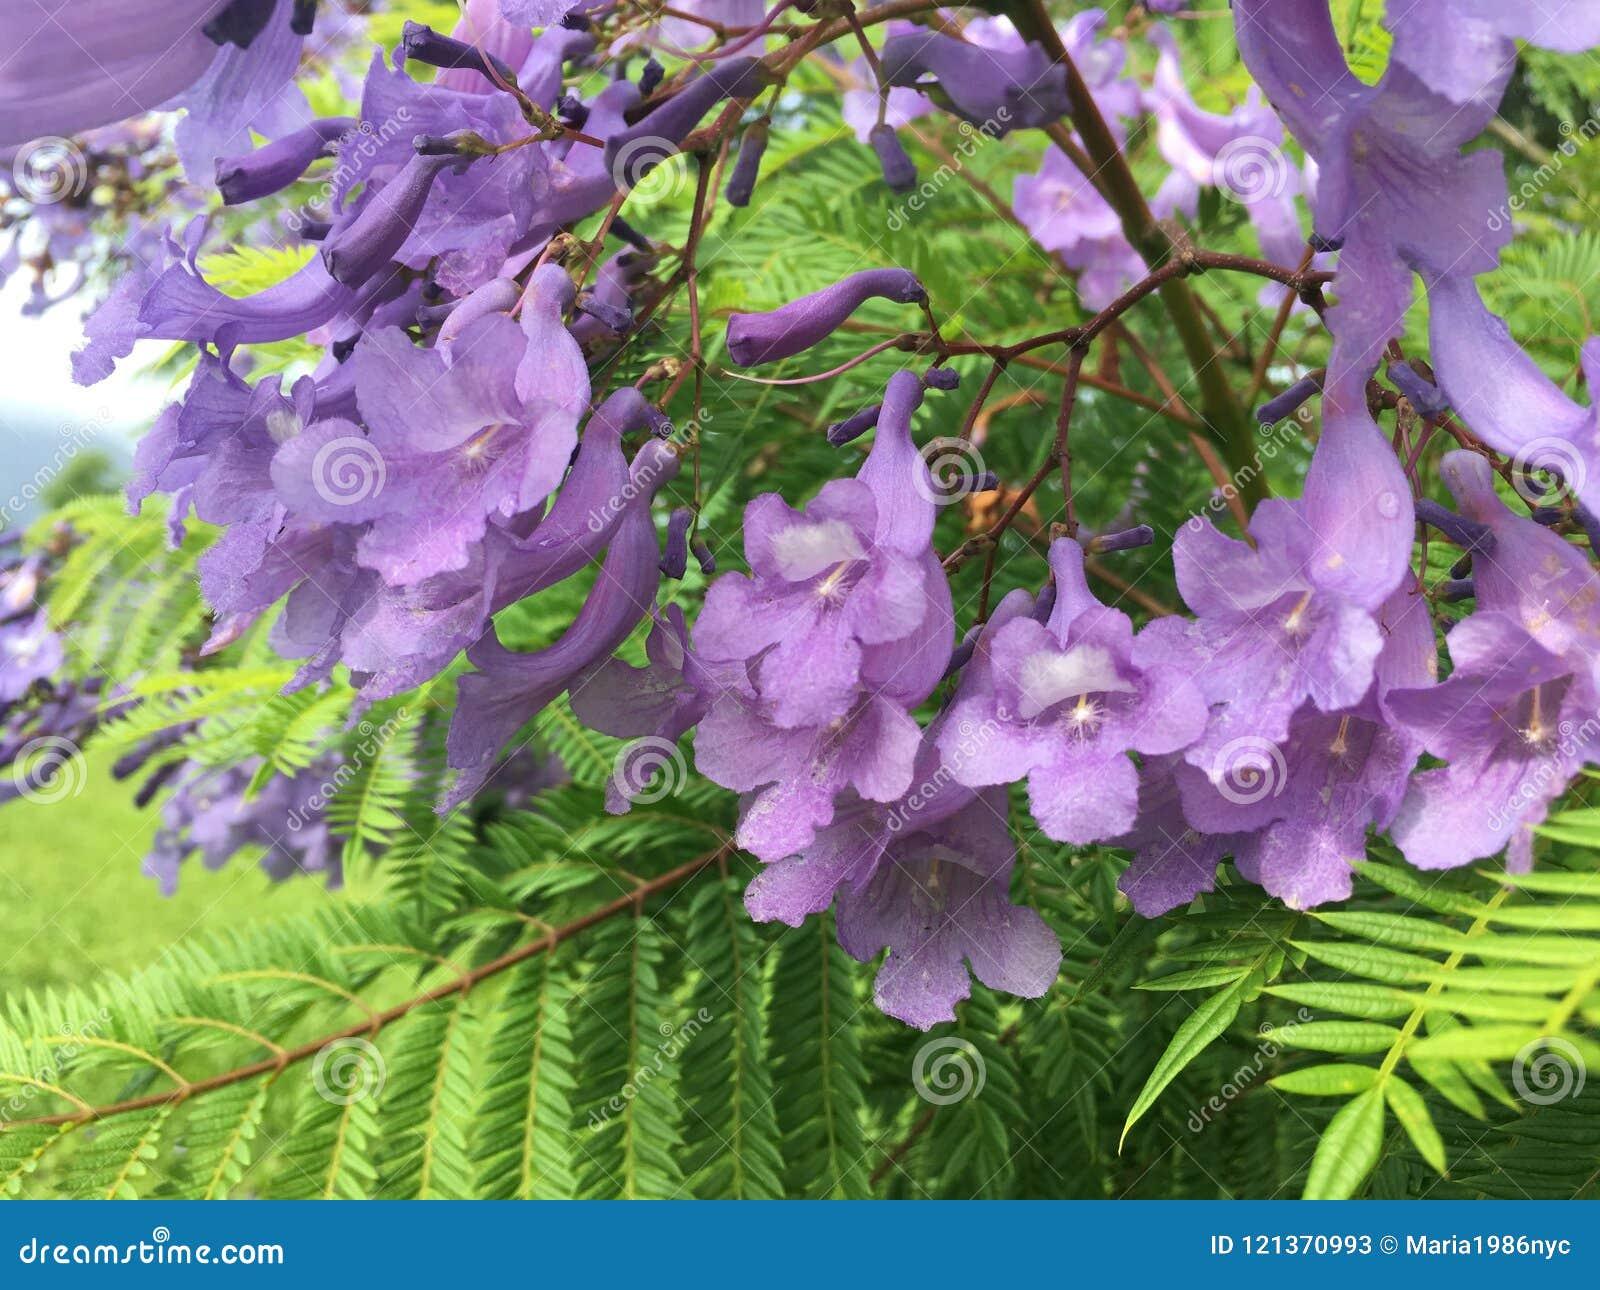 Jacaranda tree blossoming with purple flowers on kauai island jacaranda tree blossoming with purple flowers on kauai island in hawaii mightylinksfo